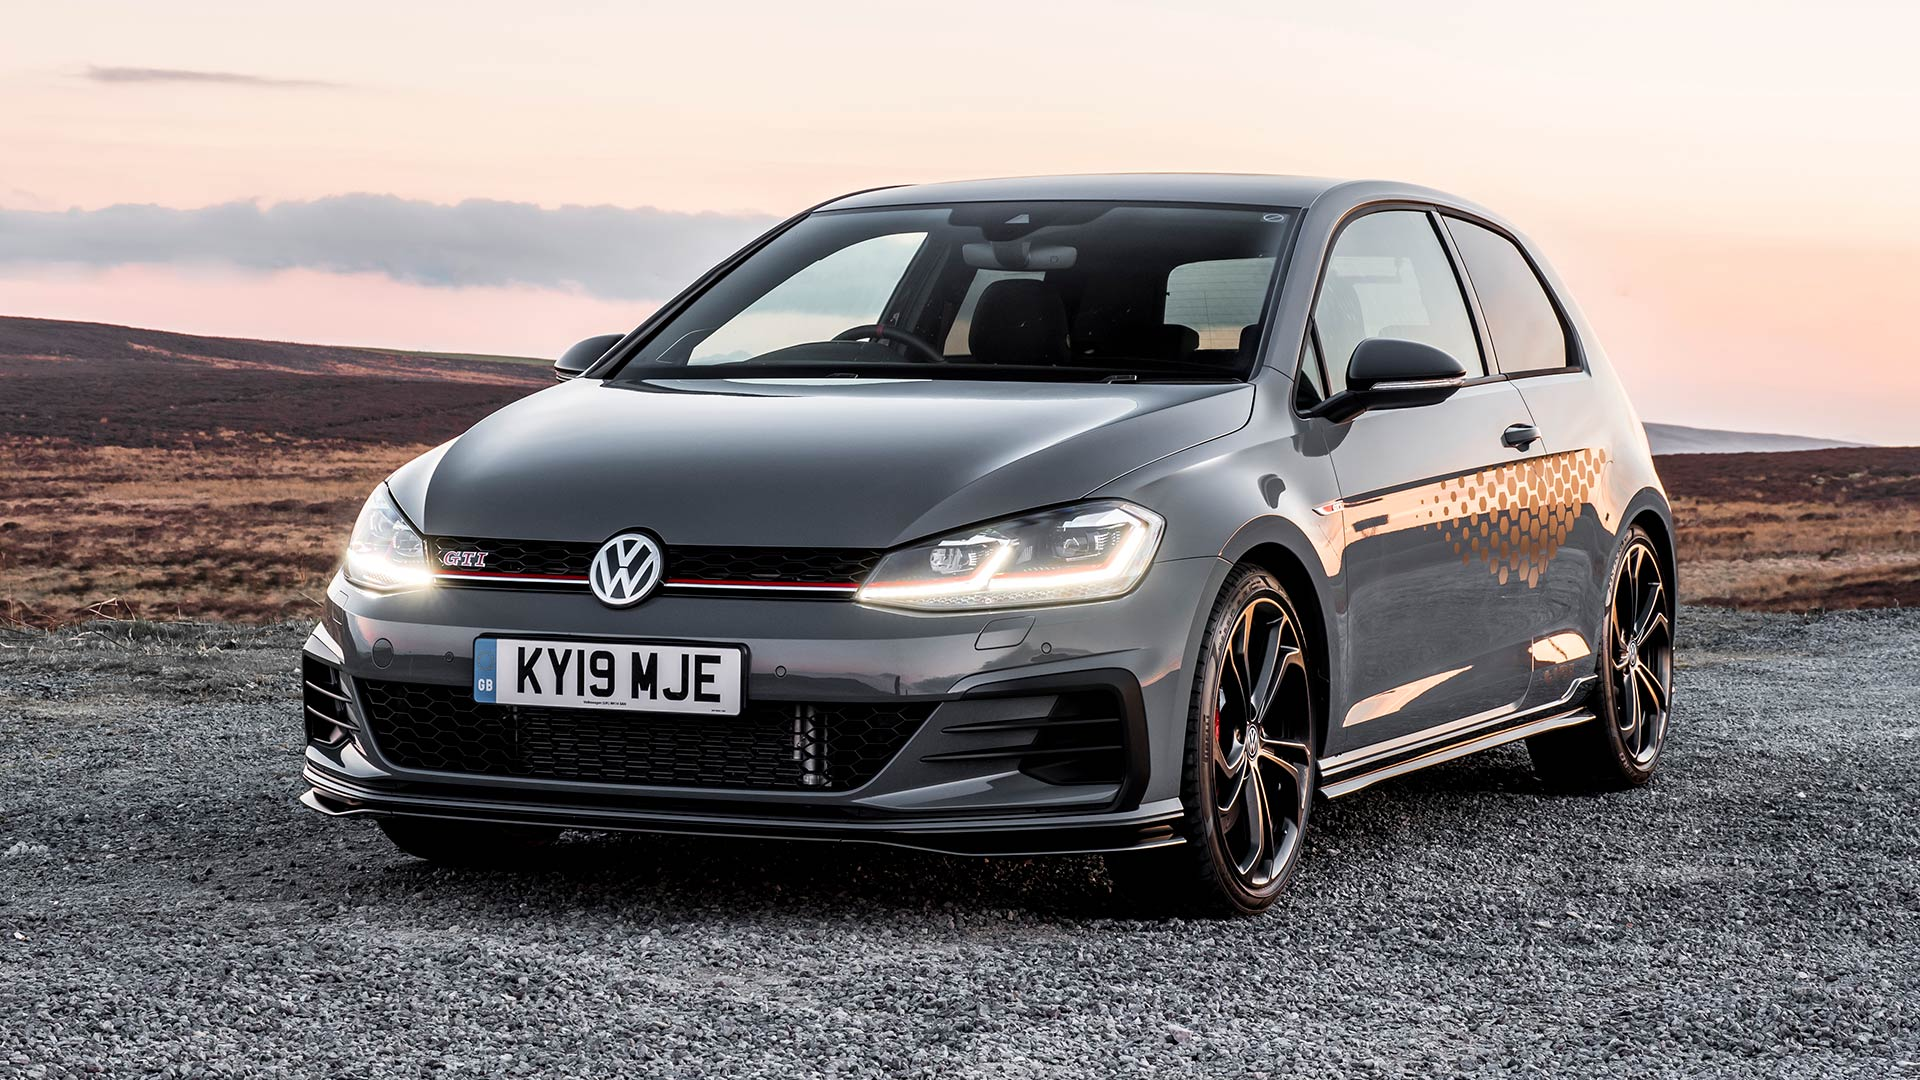 Top UK car trends of 2019